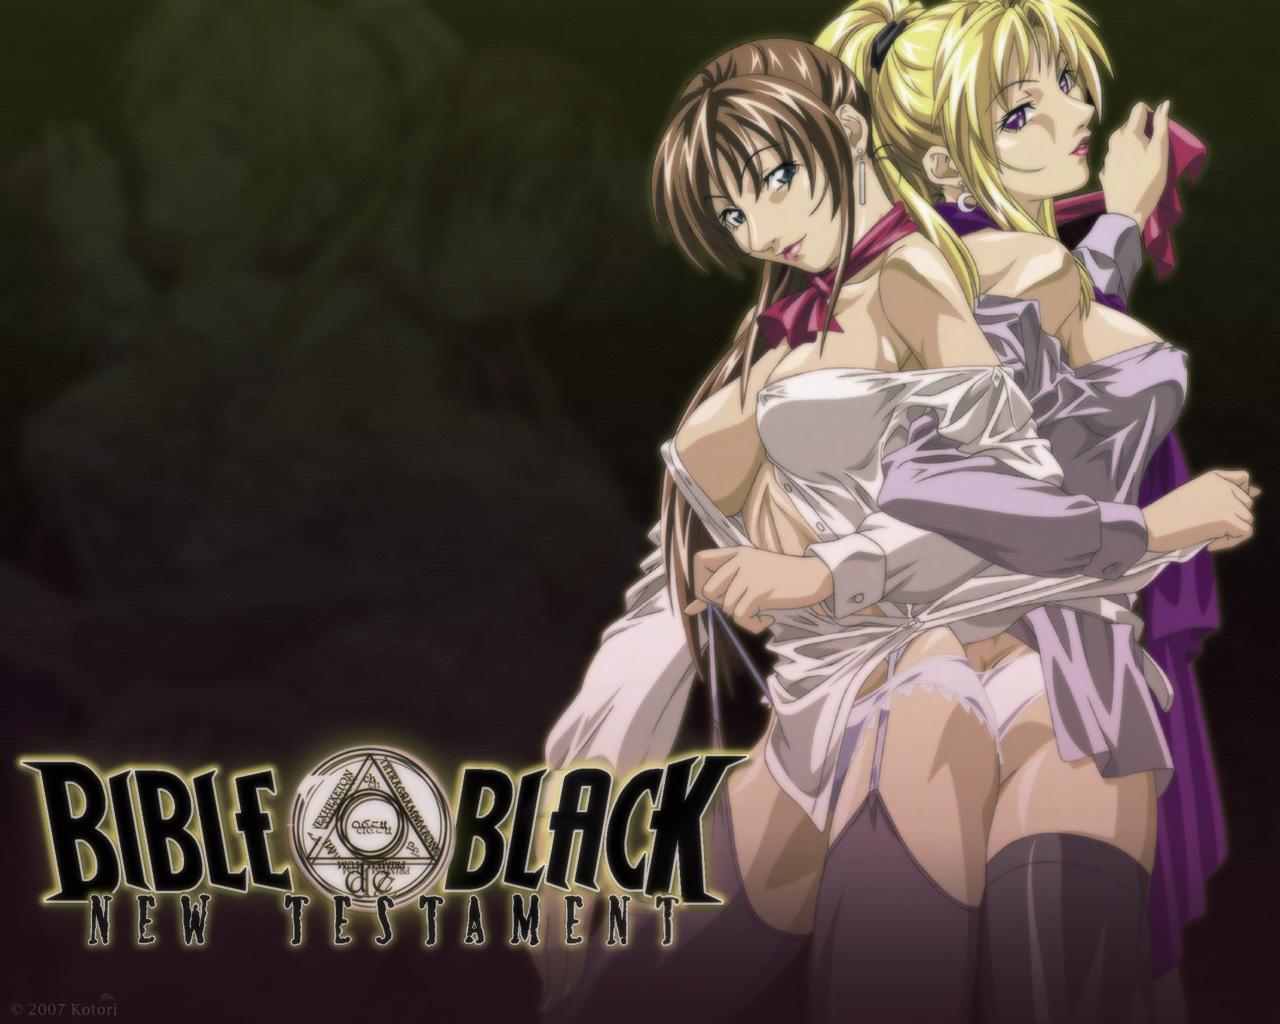 Bible black new testament hentai wallpaper